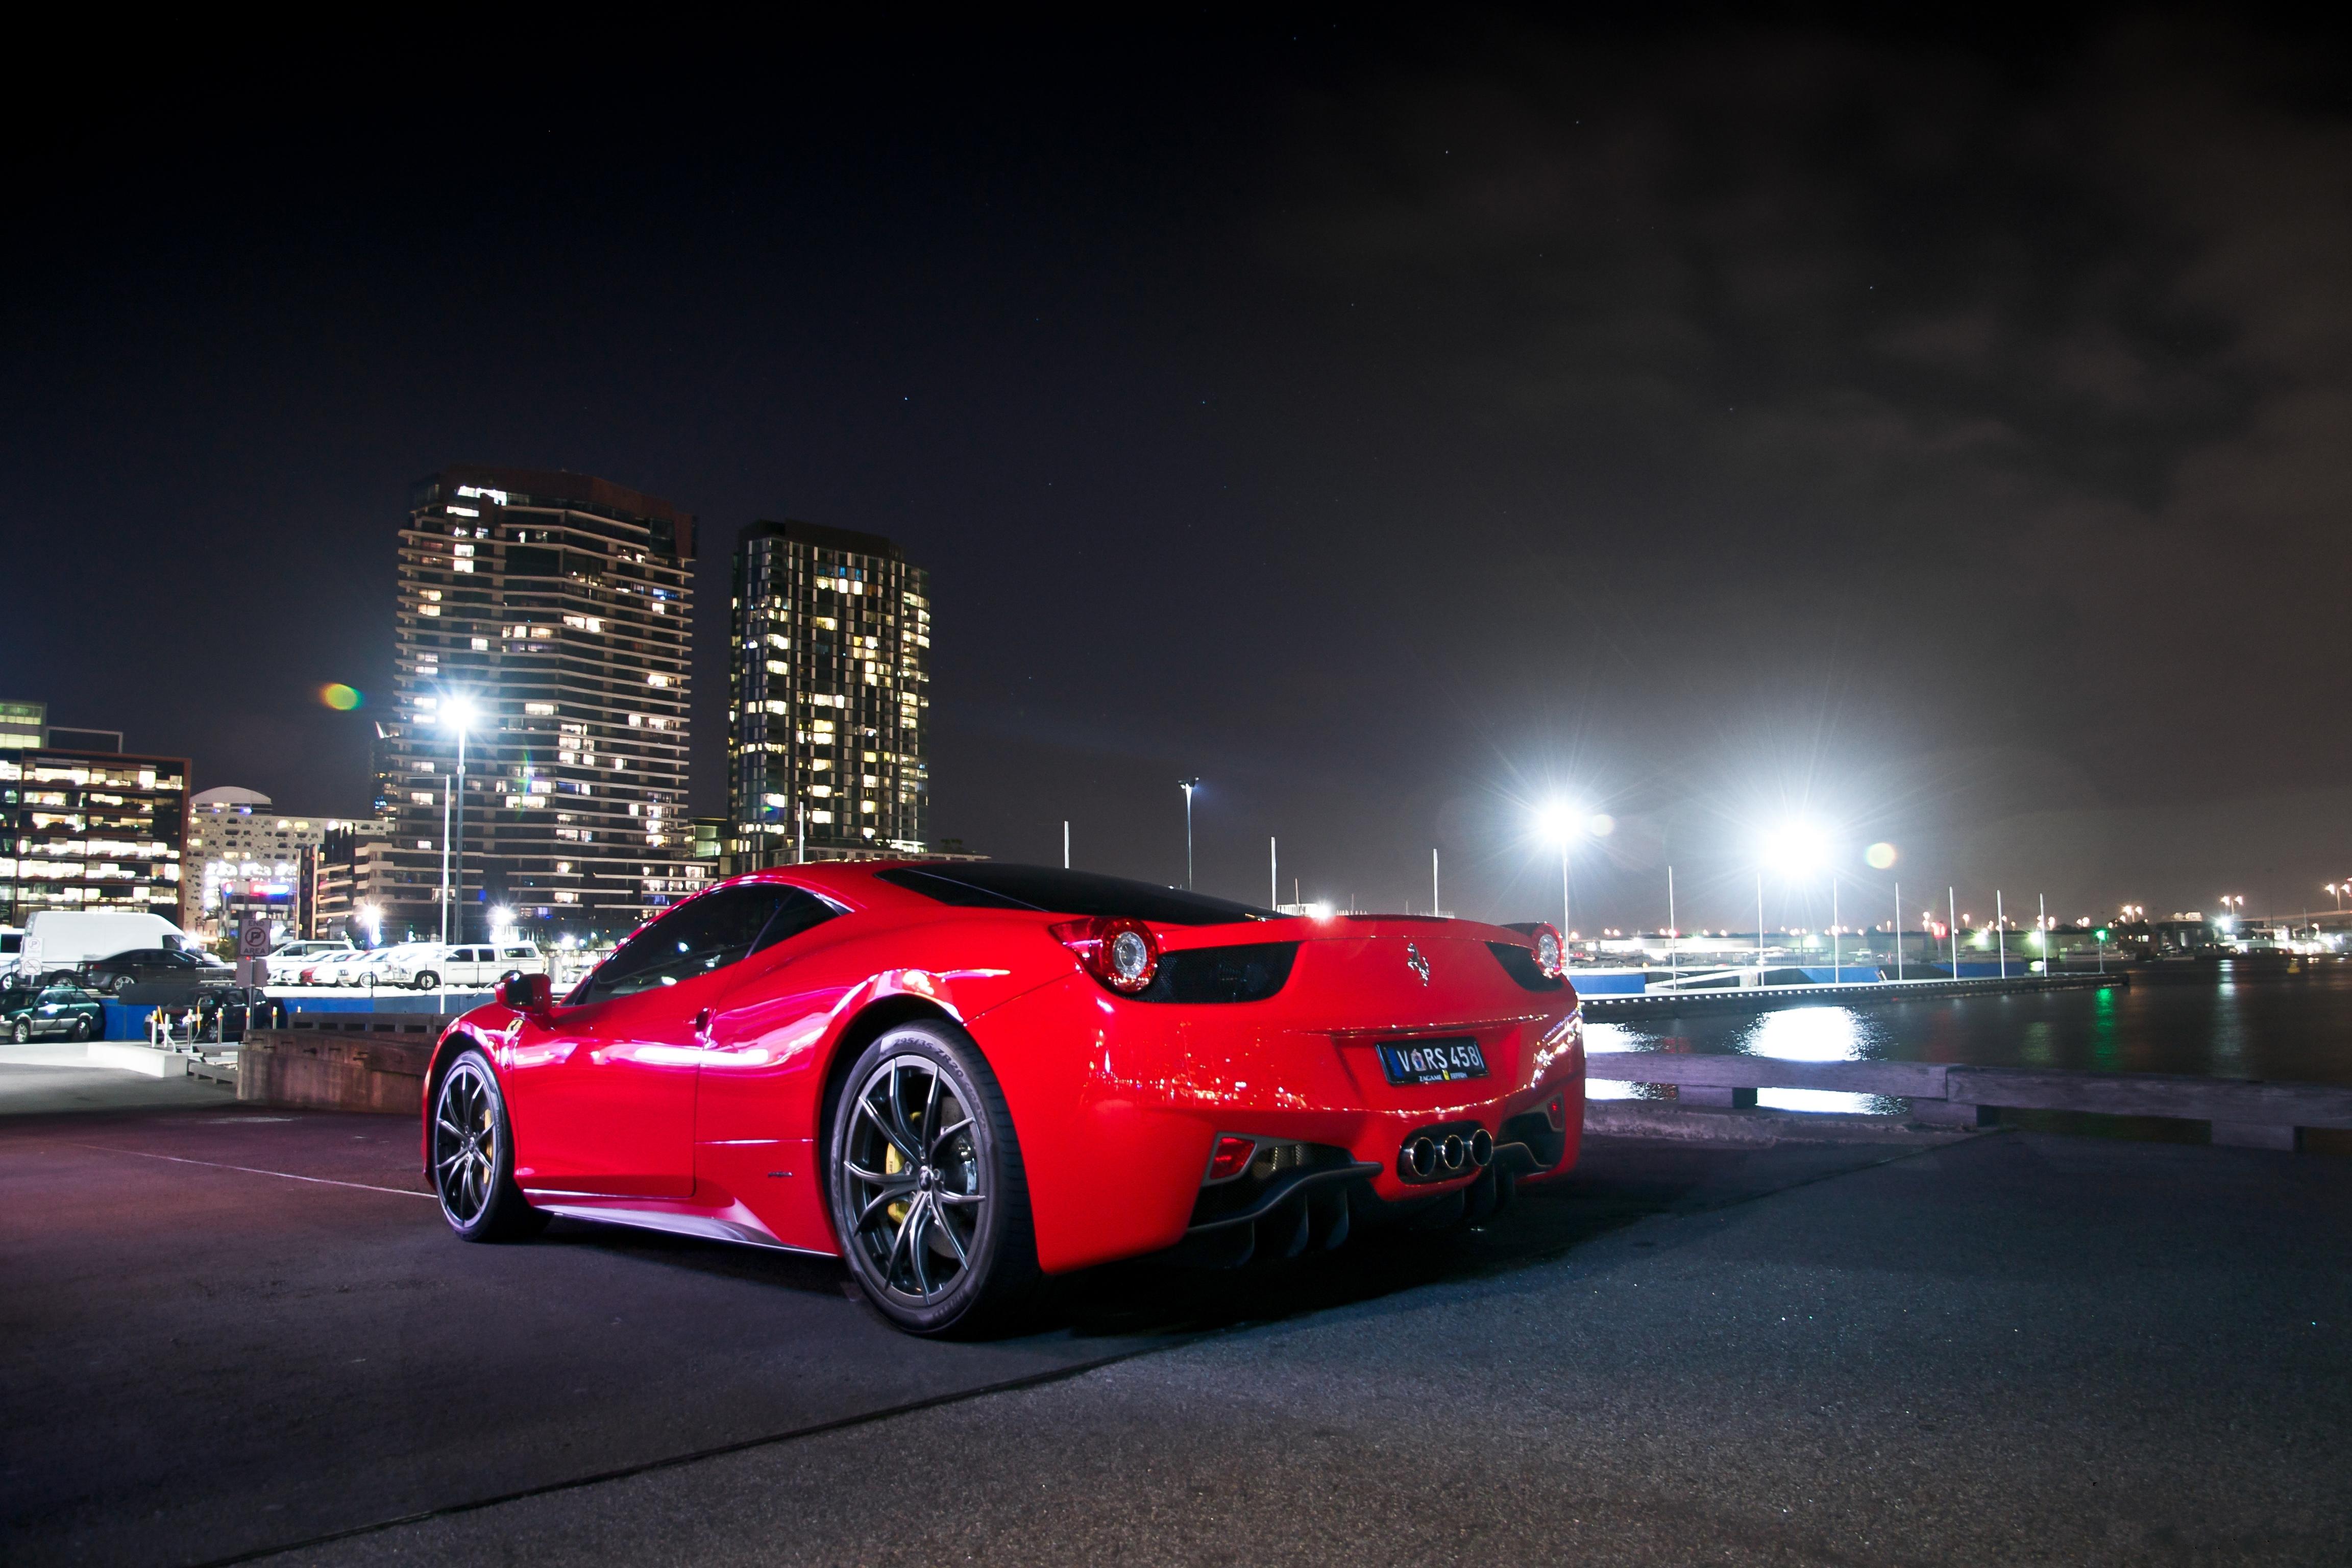 Ferrari 458 4k Ultra Hd Wallpaper Background Image 4608x3072